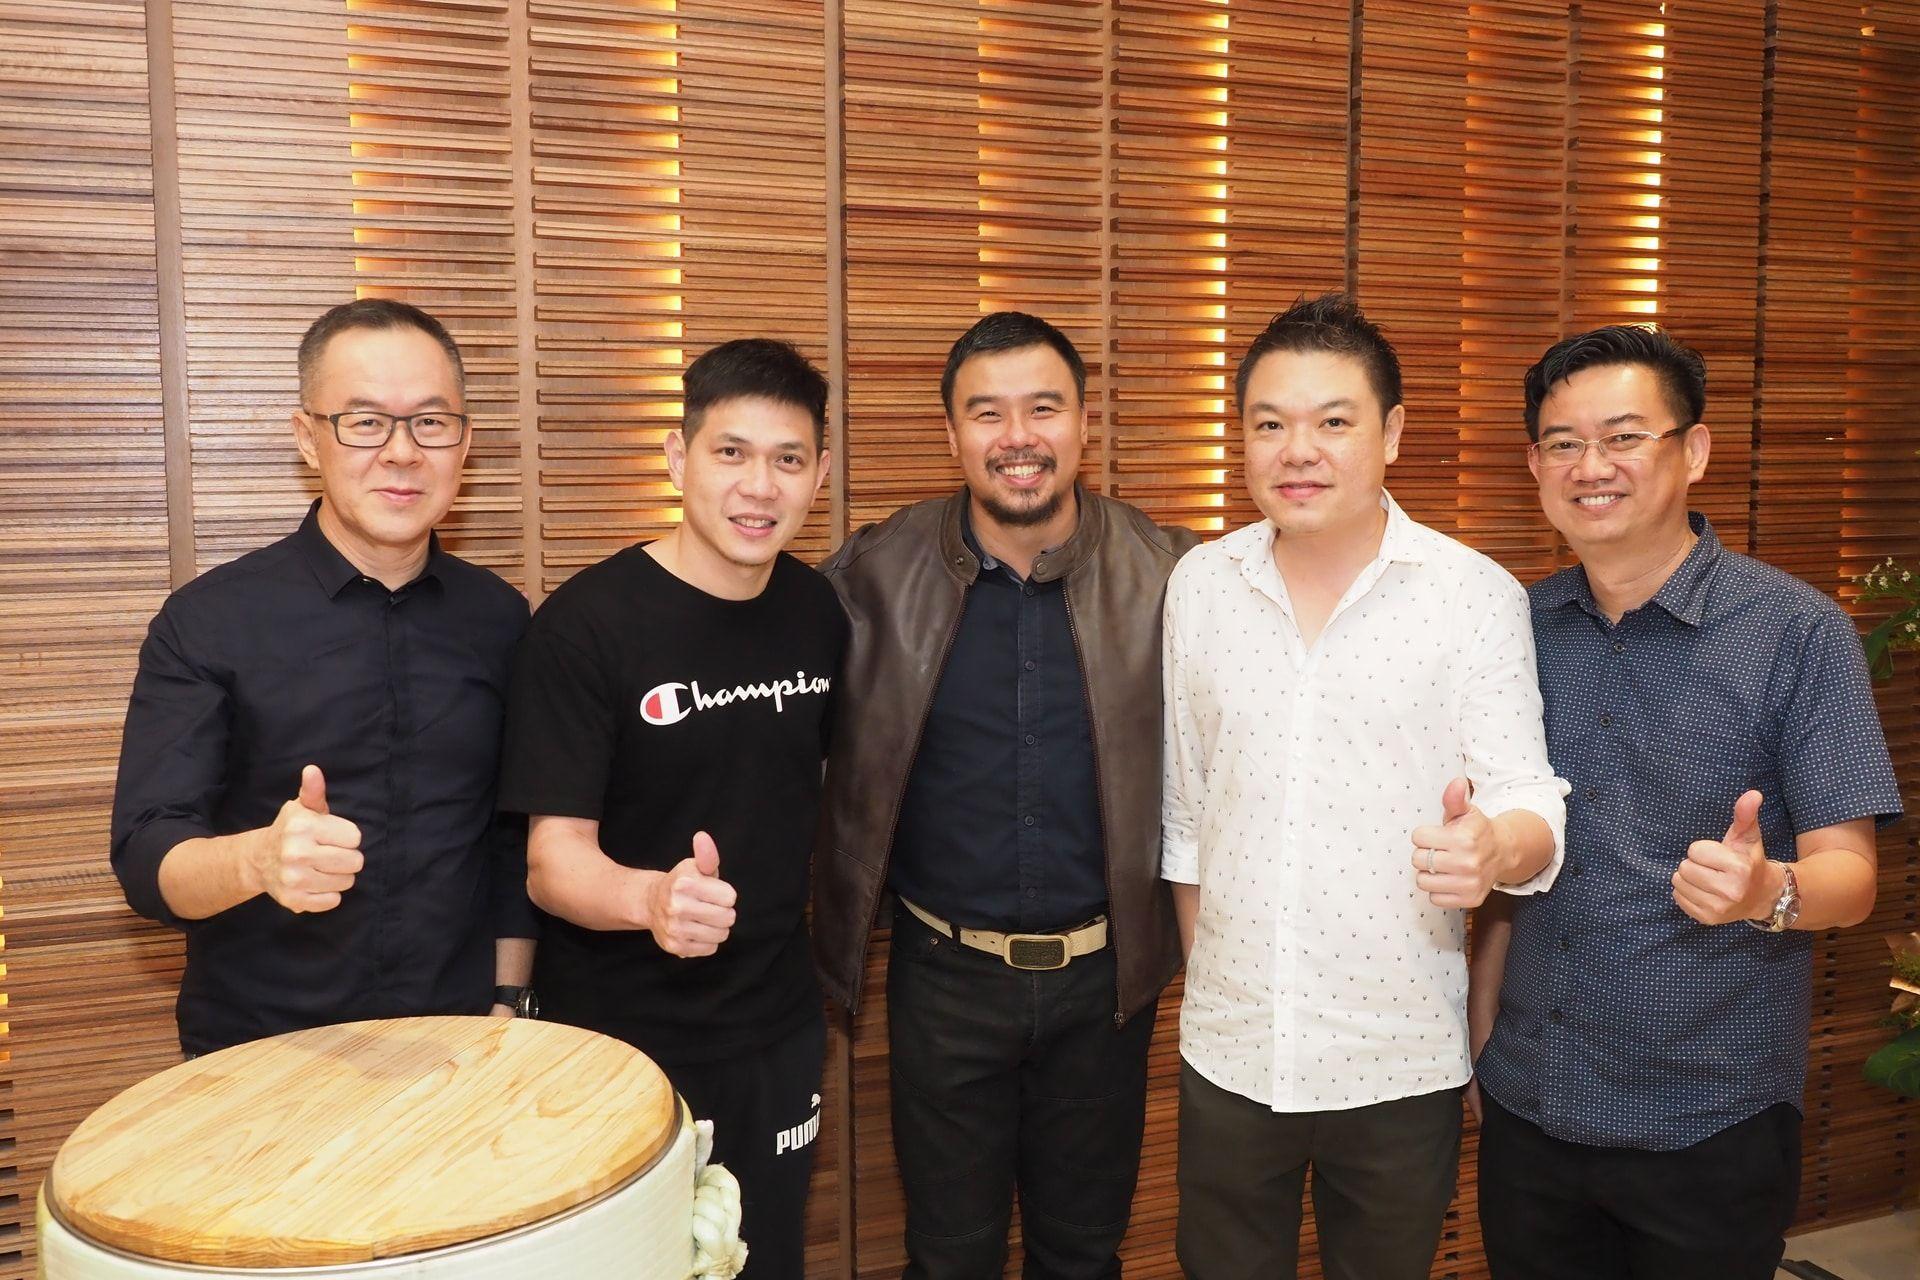 TJ, Choon Eng, Shawn Lee, Keny Yong and Melvin See